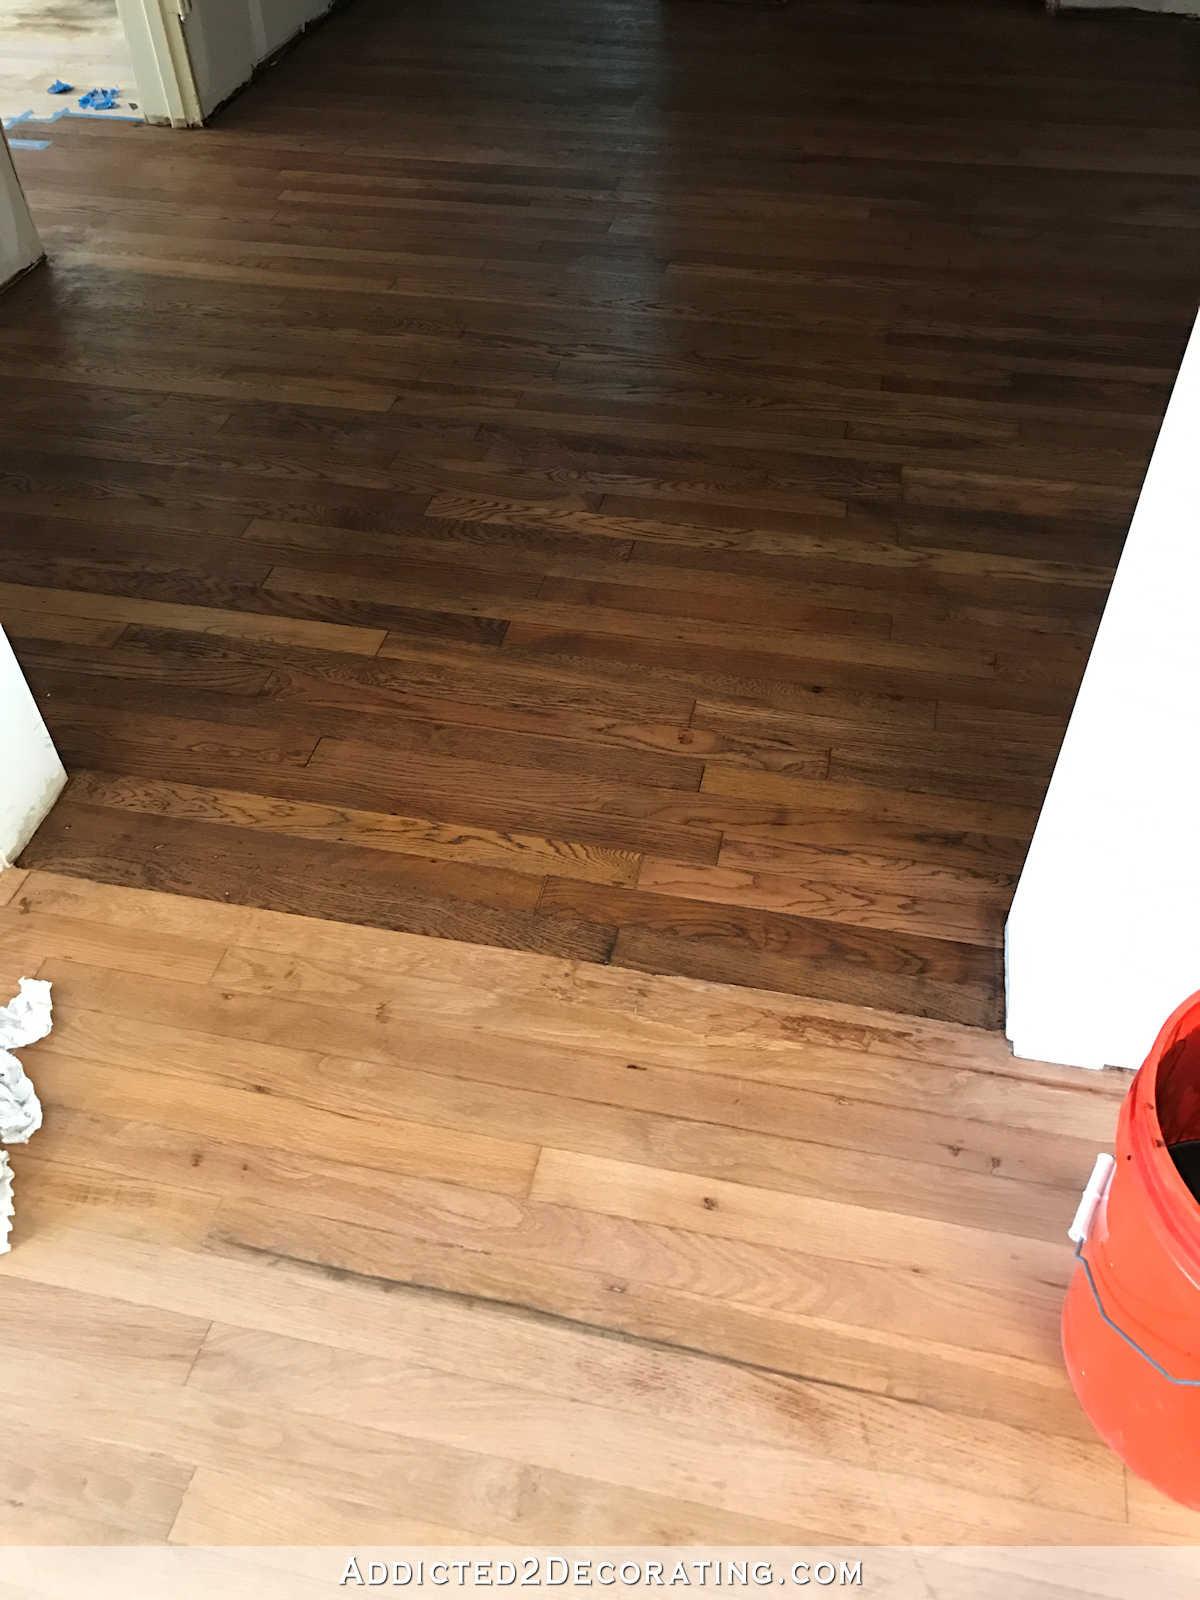 hardwood flooring summit nj of getting paint off wood floor adventures in staining my red oak with regard to getting paint off wood floor adventures in staining my red oak hardwood floors products process